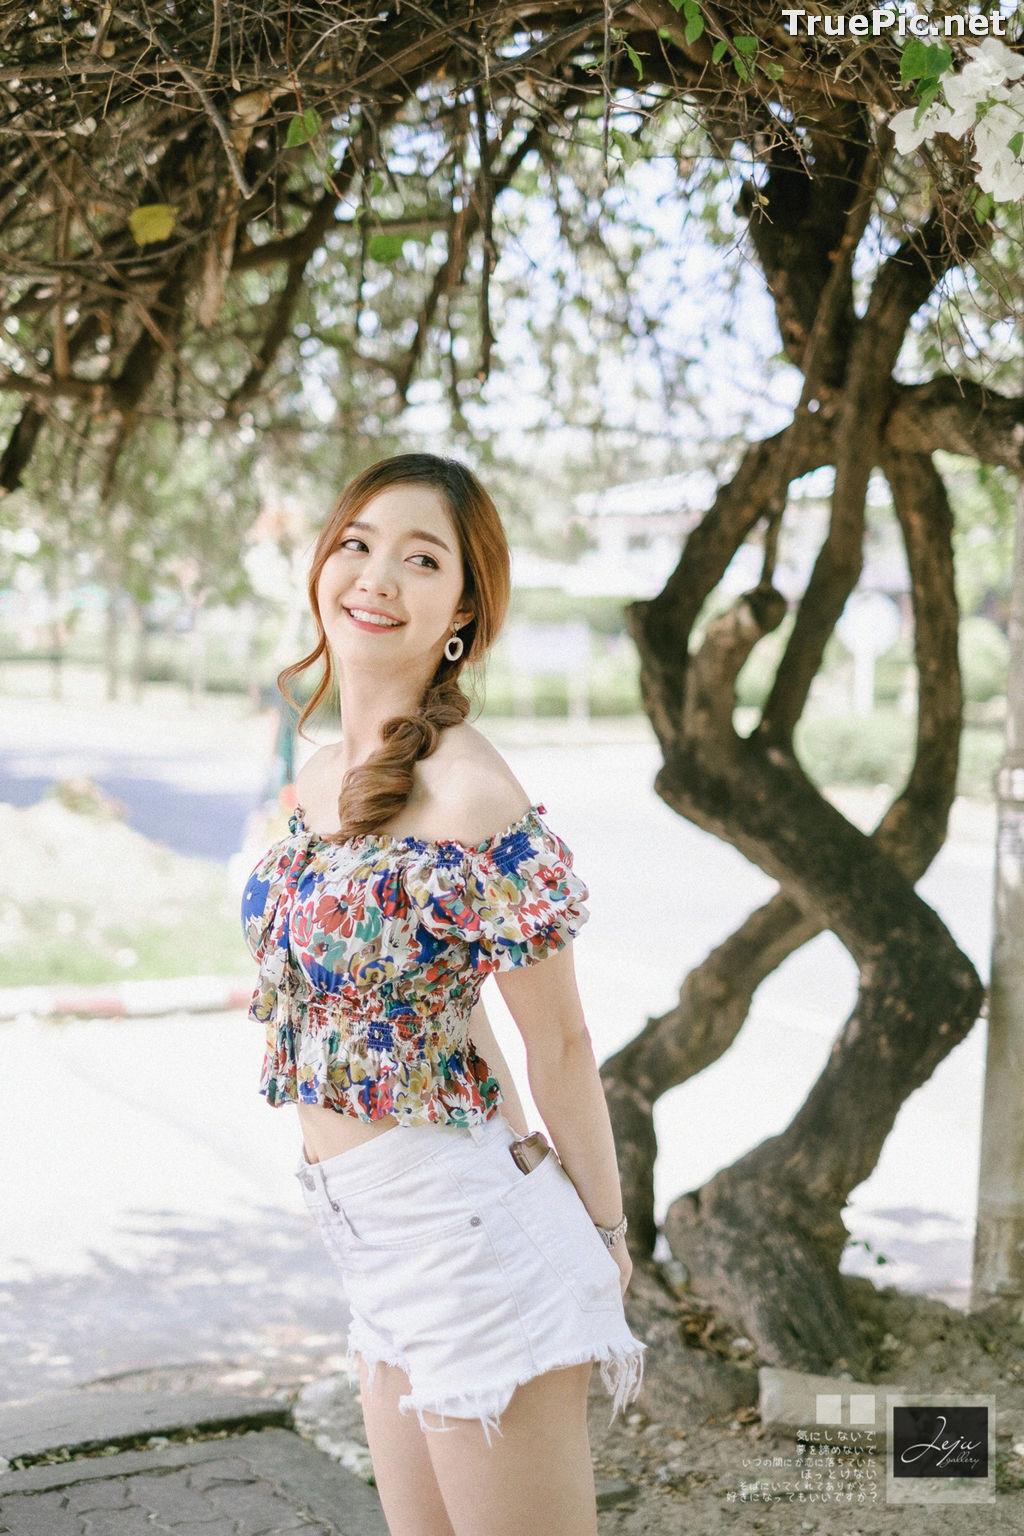 Image Thailand Beautiful Model - Viva Pongdechkajorn - Tetta Viva - TruePic.net - Picture-6